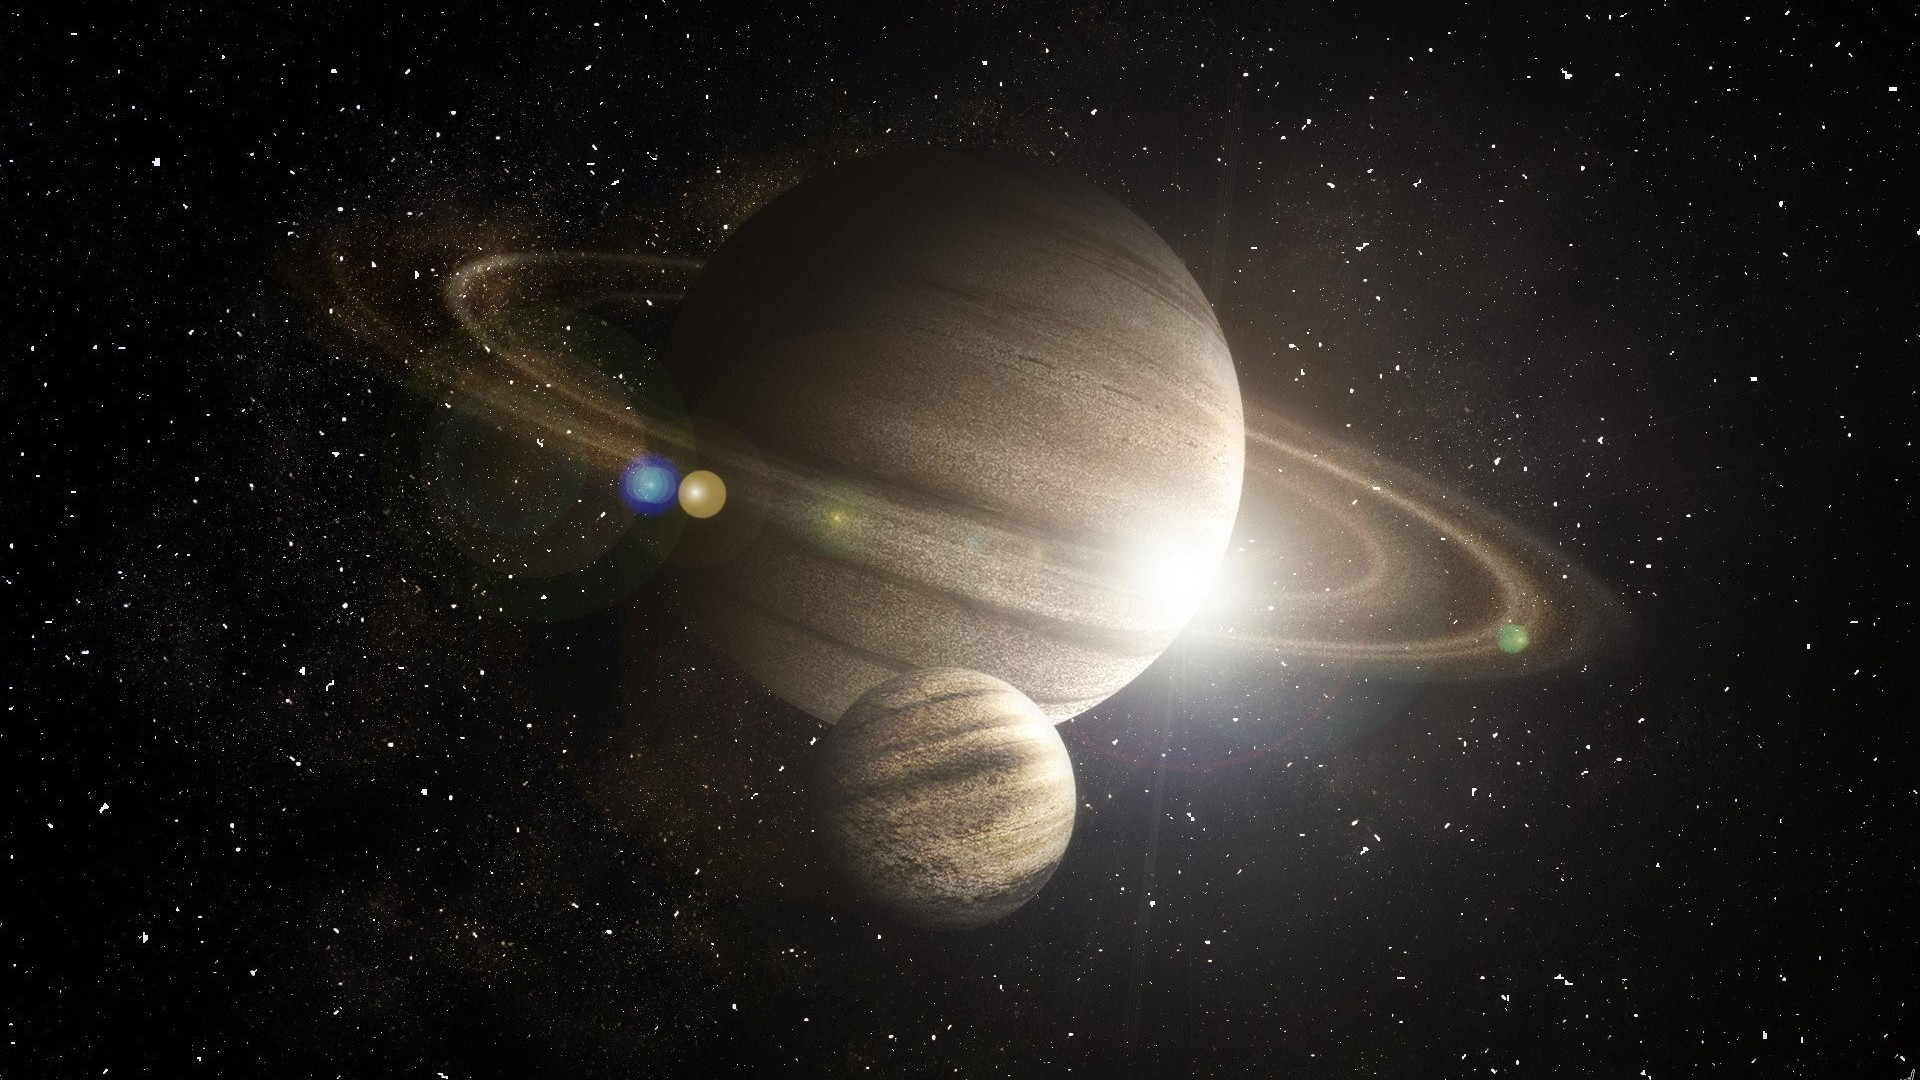 Saturn Image